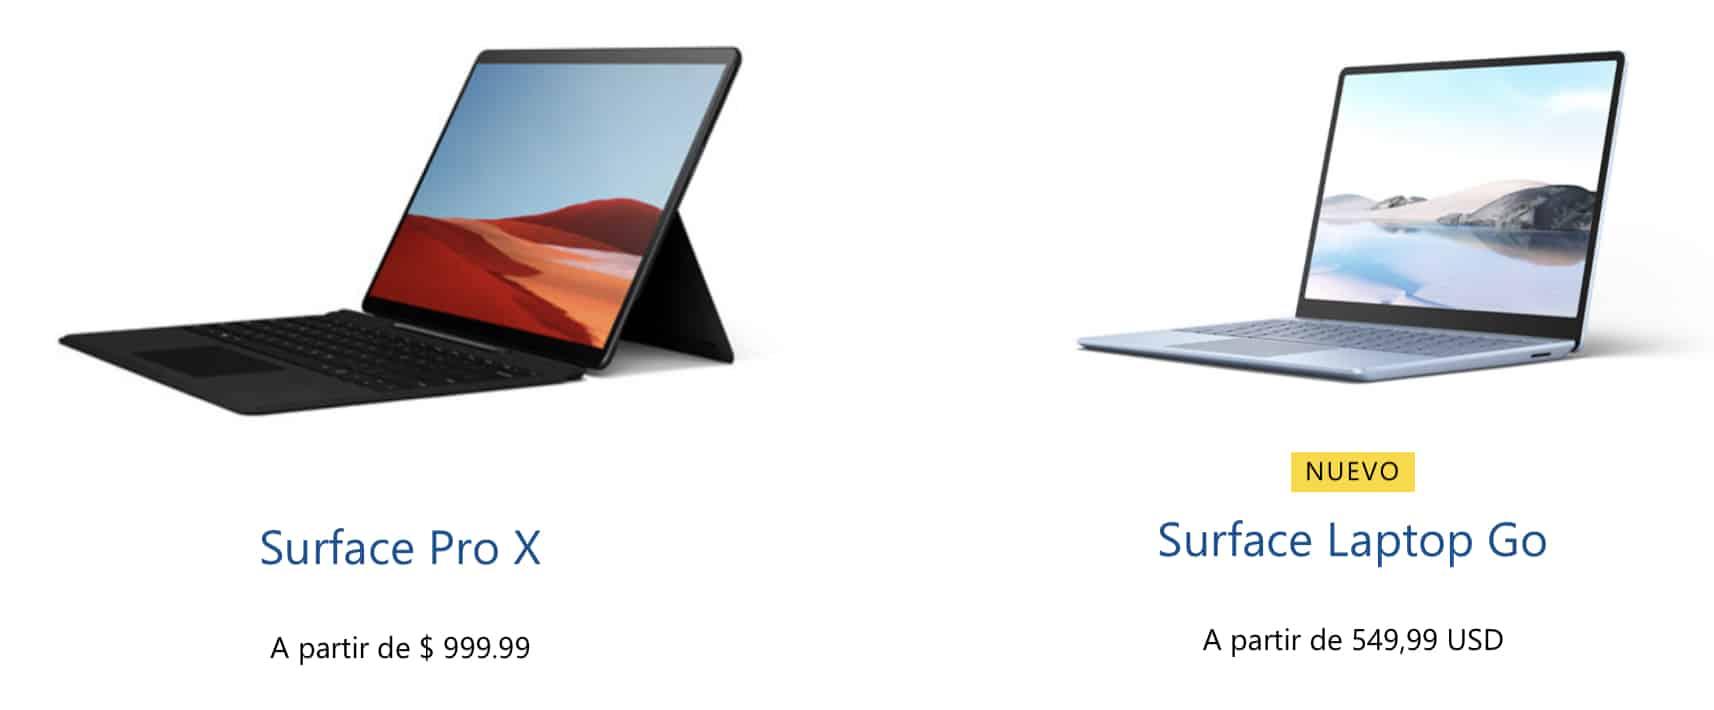 Surface Laptop Go y Surface Pro X